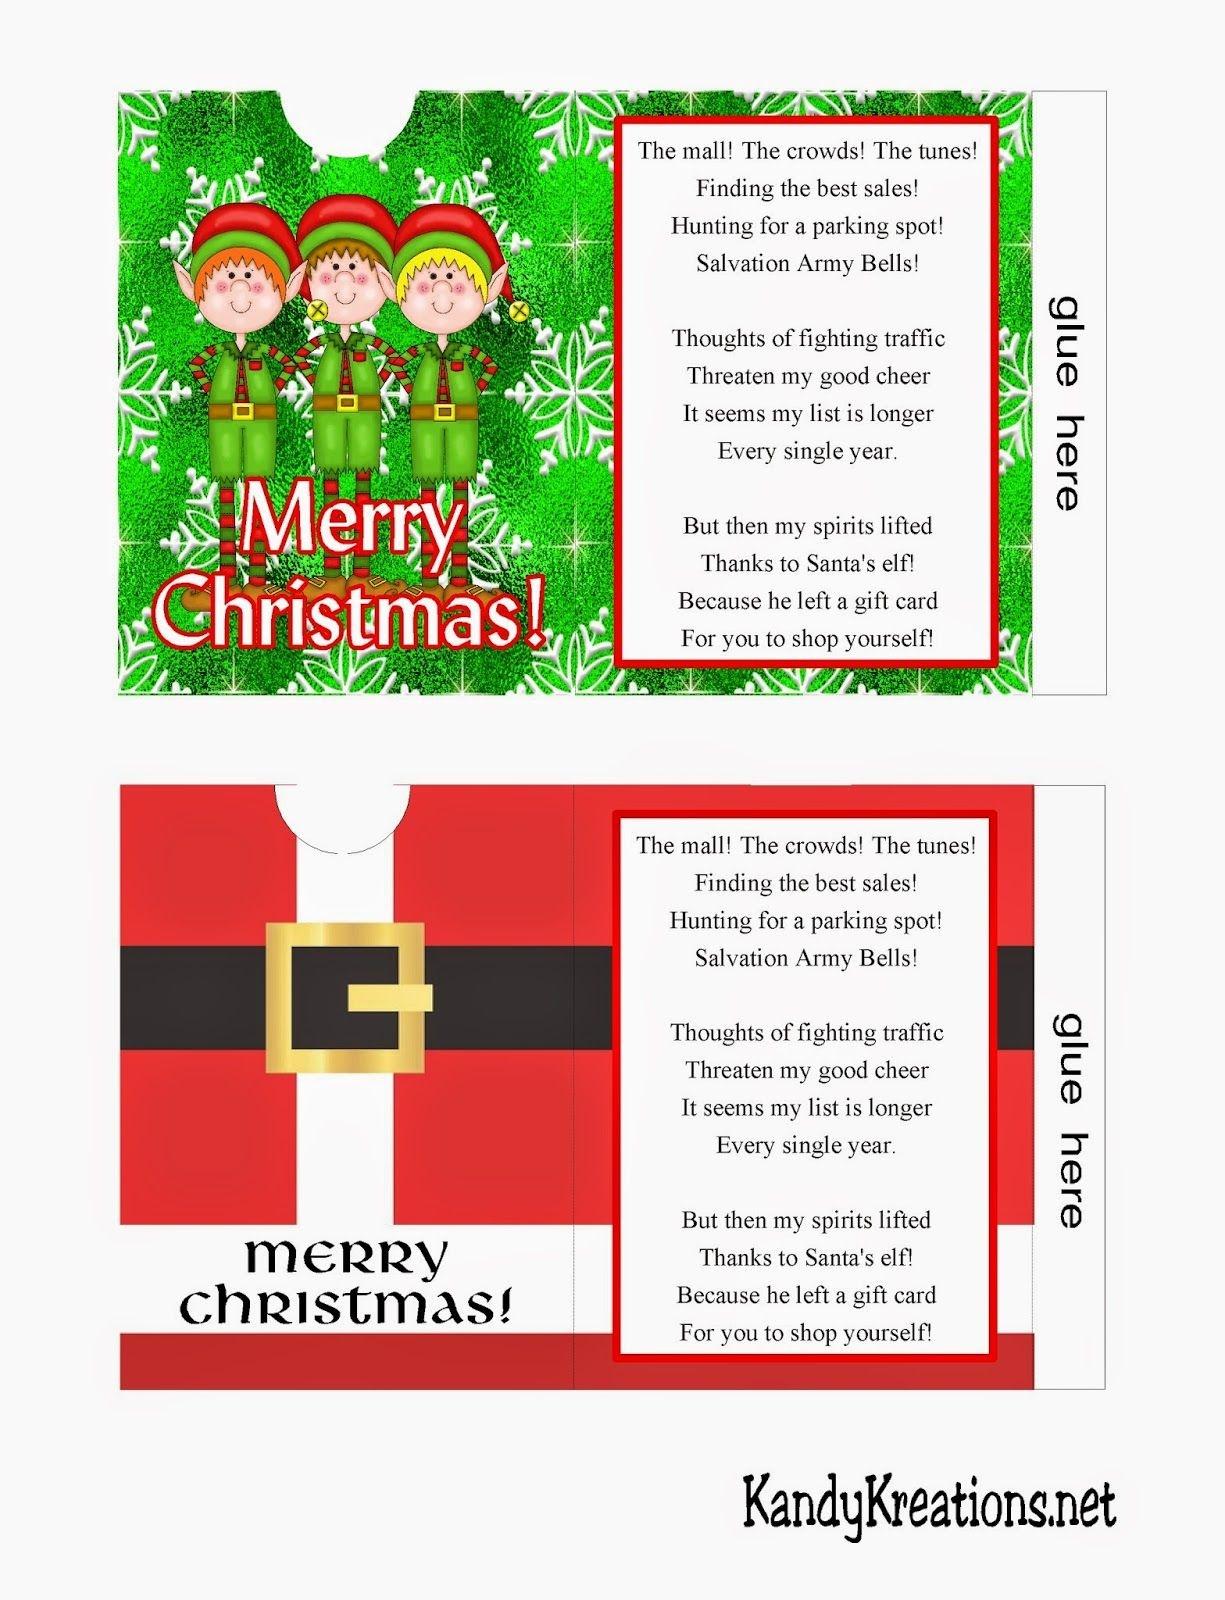 Christmas Gift Card Envelope Free Printables | Christmas Printables - Free Printable Christmas Gift Card Envelopes